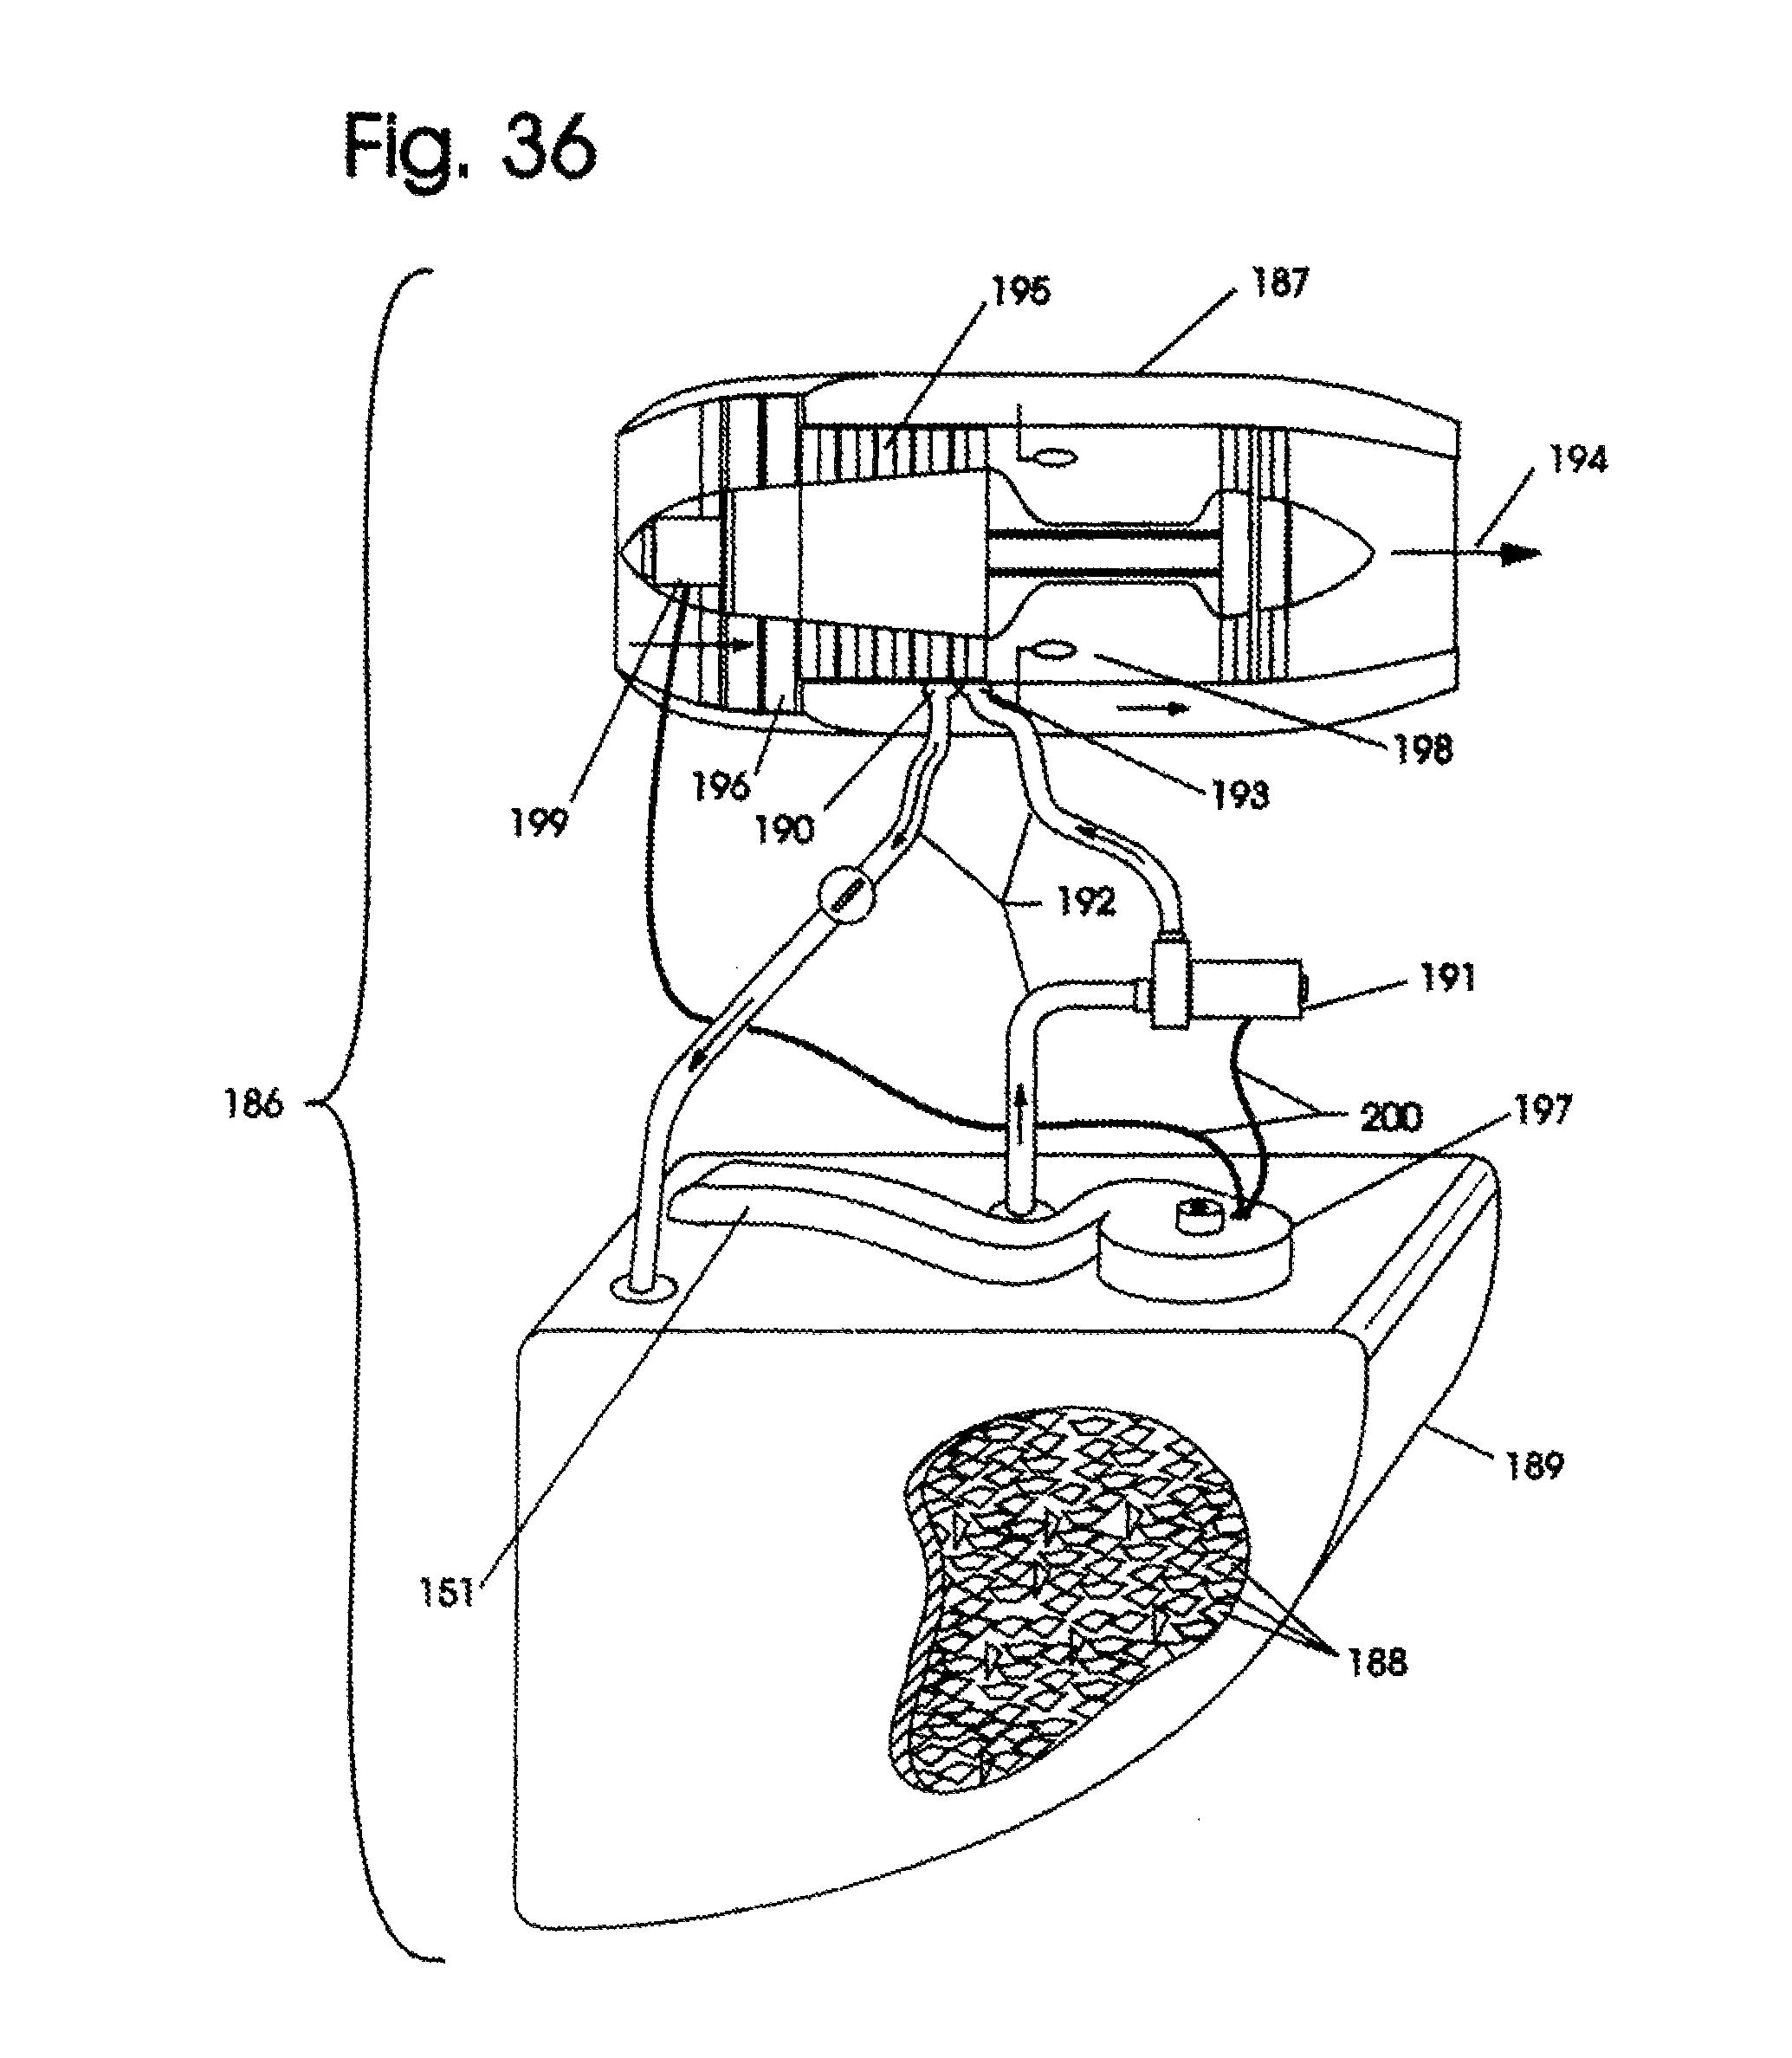 bat wiring diagram 1997 f250 wiring diagram door residential electrical wiring diagrams for bat